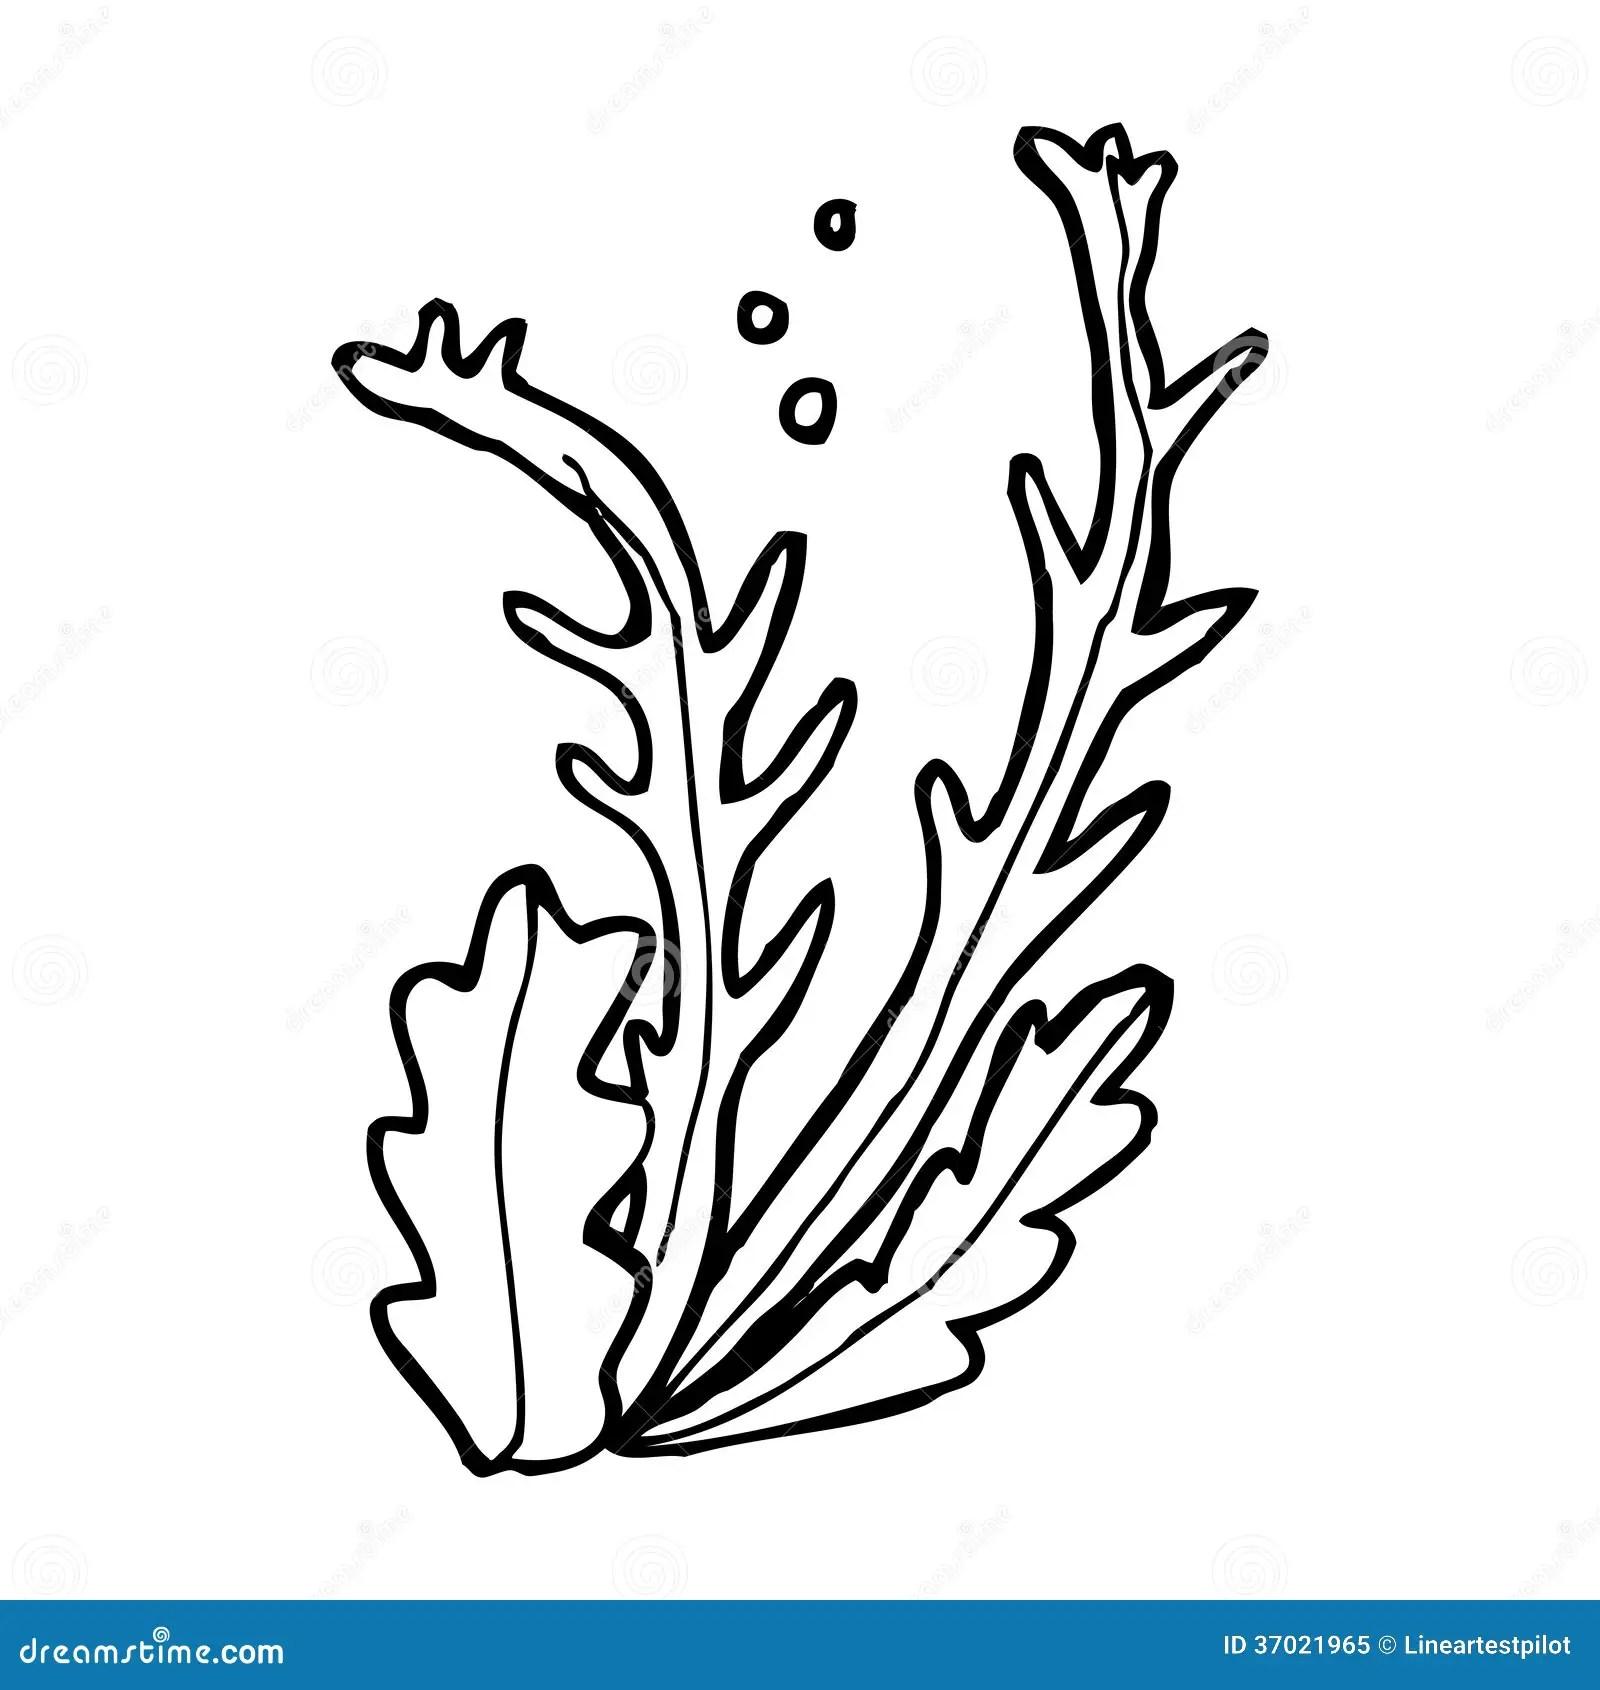 Cartoon seaweed stock illustration. Image of drawn, funny